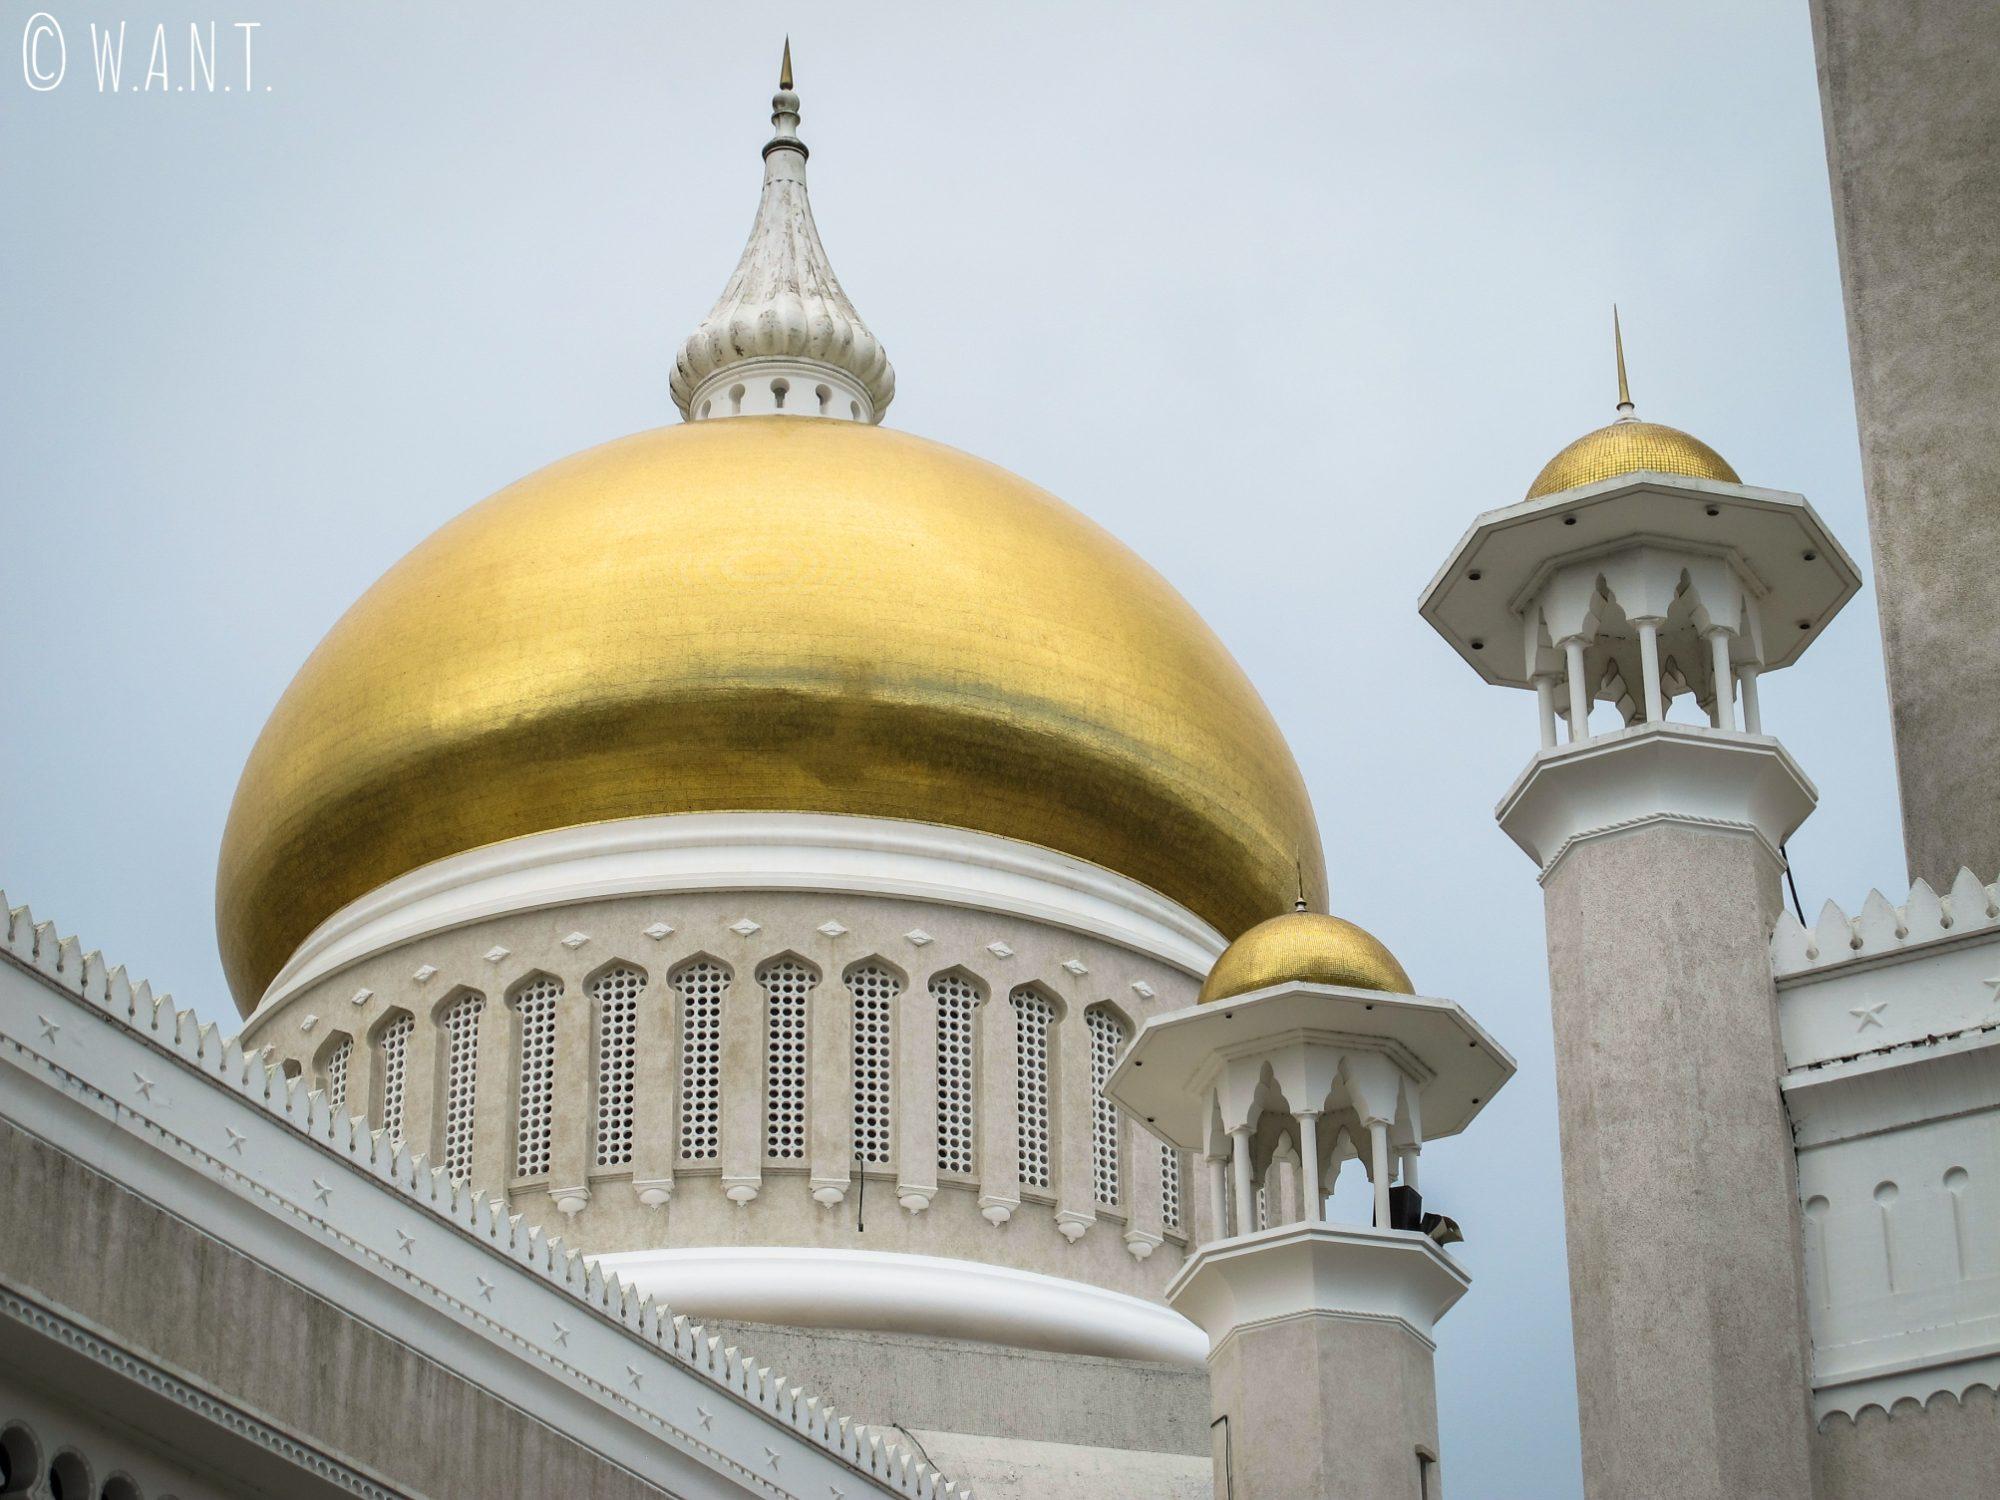 Dôme principal de la mosquée Masjid Omar Ali Saifuddien de Bandar Seri Begawan